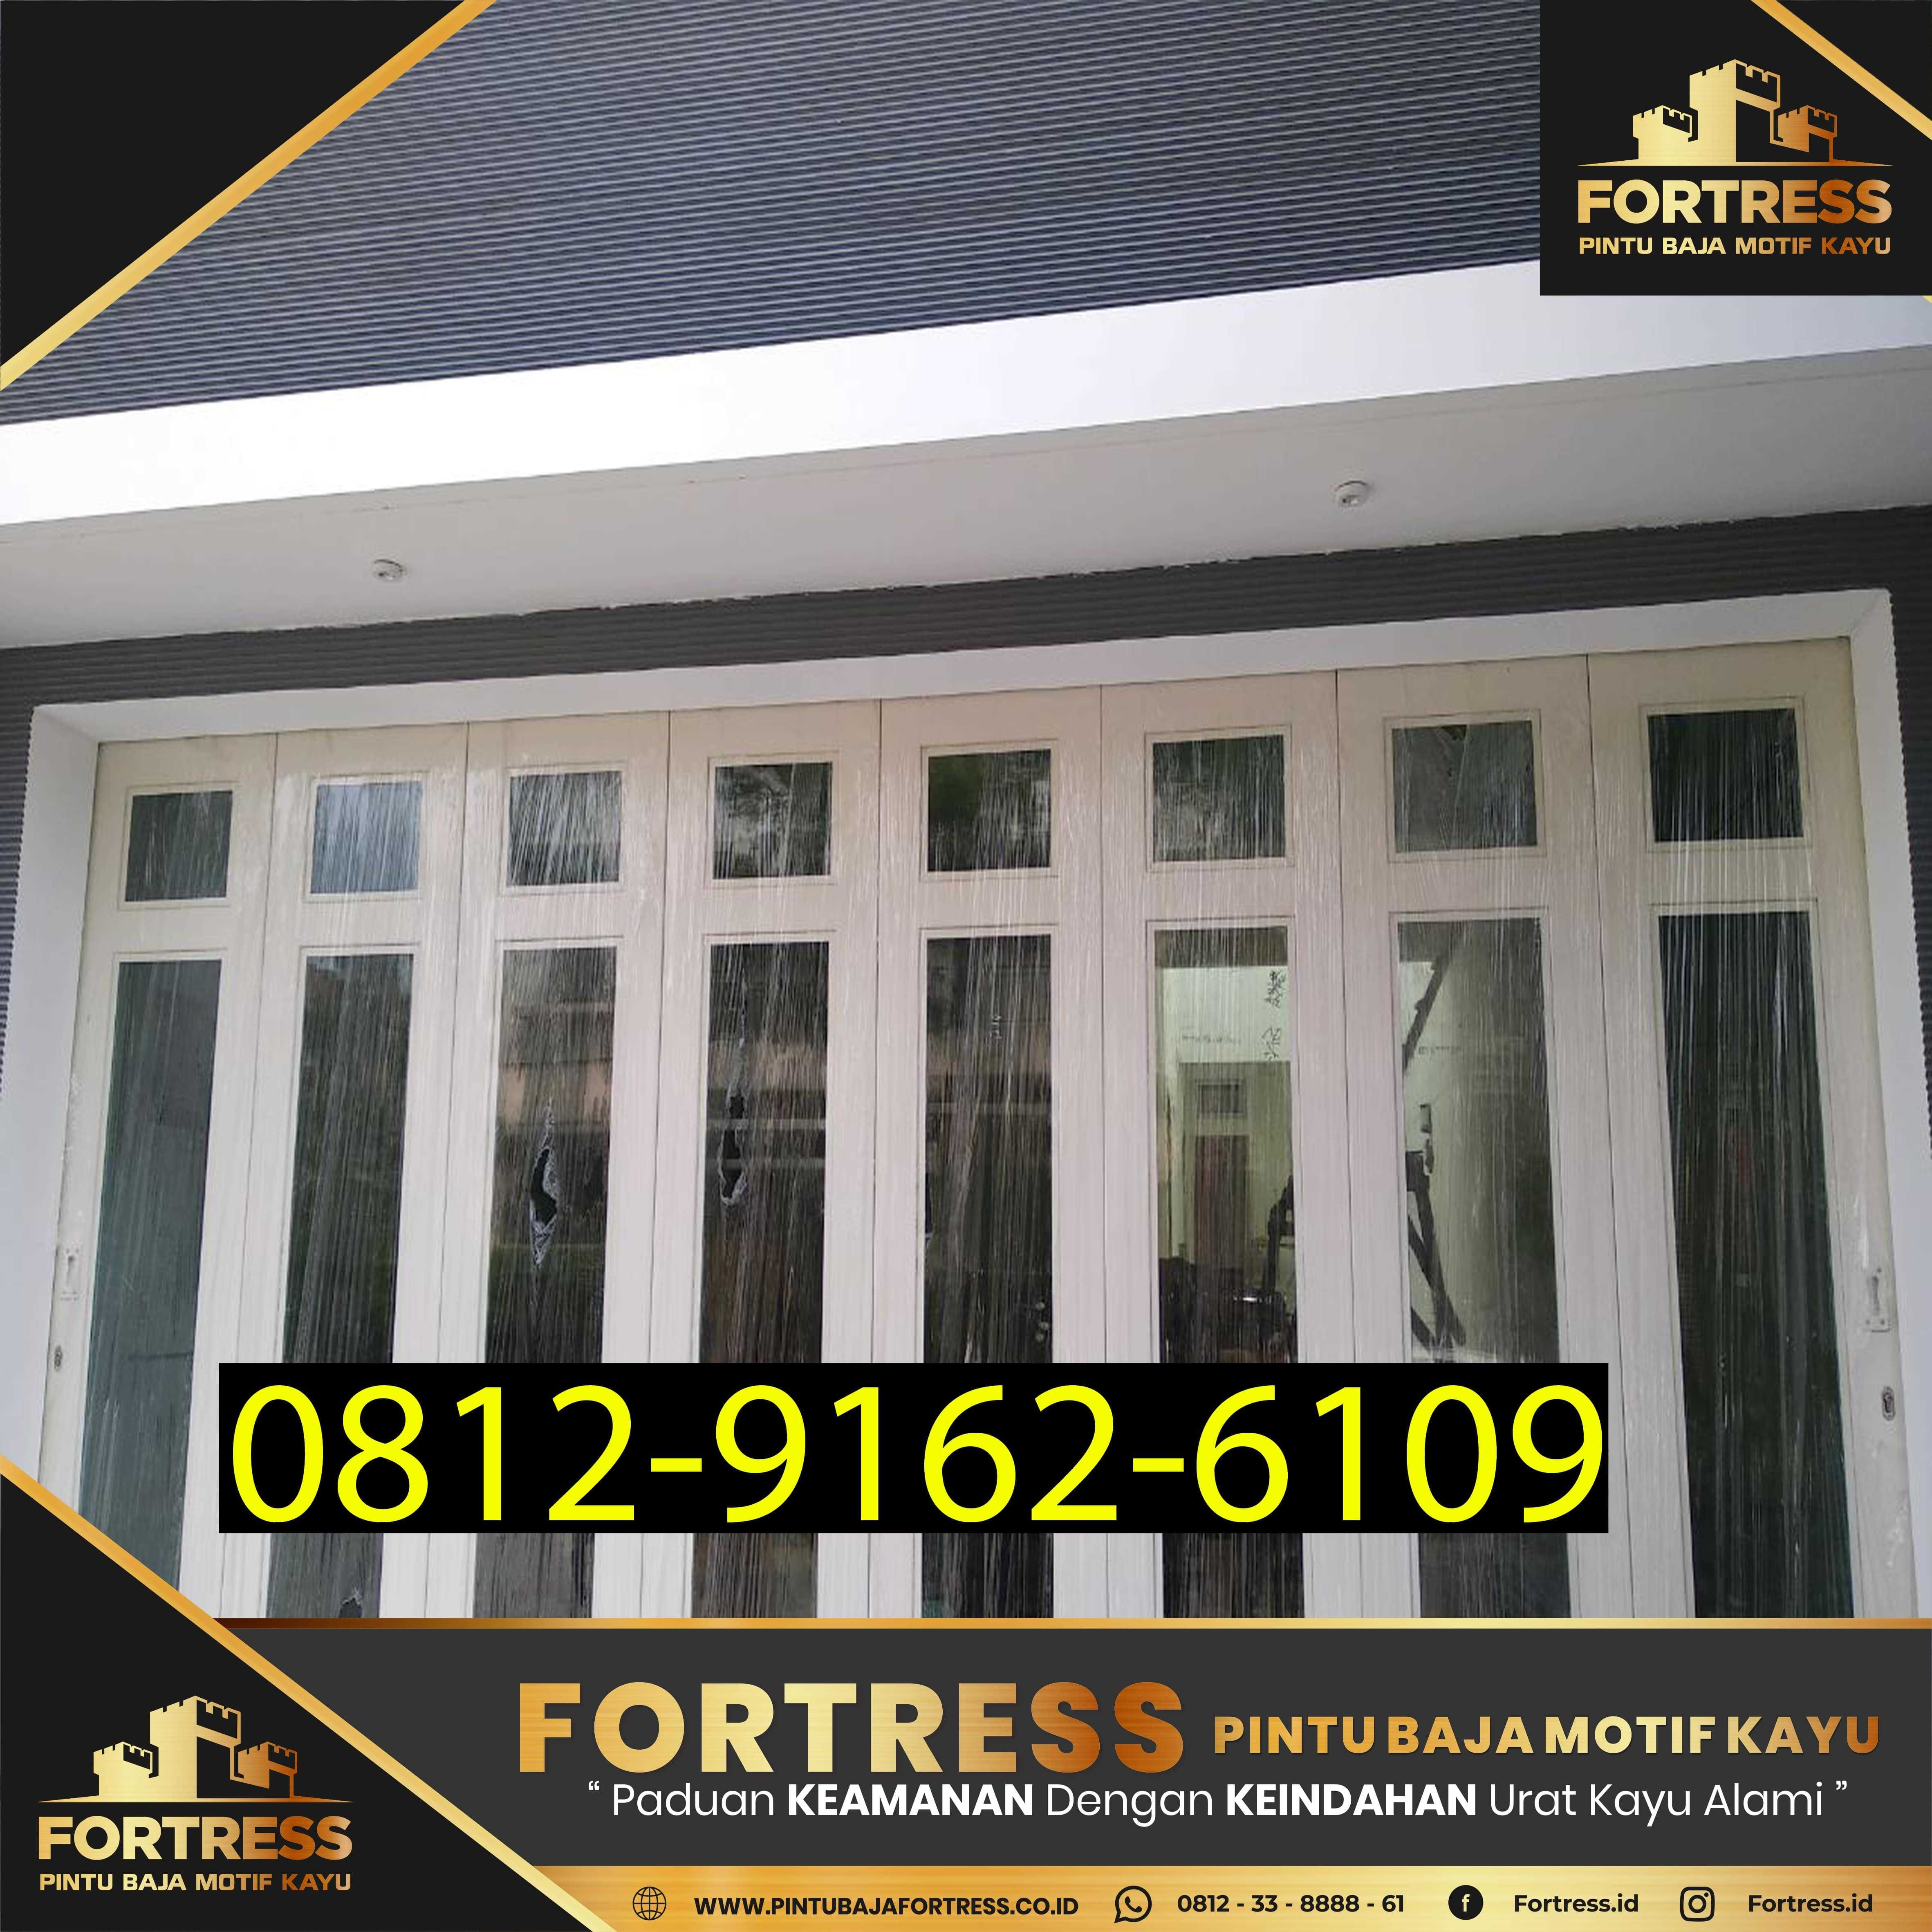 0812-9162-6109 (JBS), Minimalist Garage Doors Made of Iron, Pint…